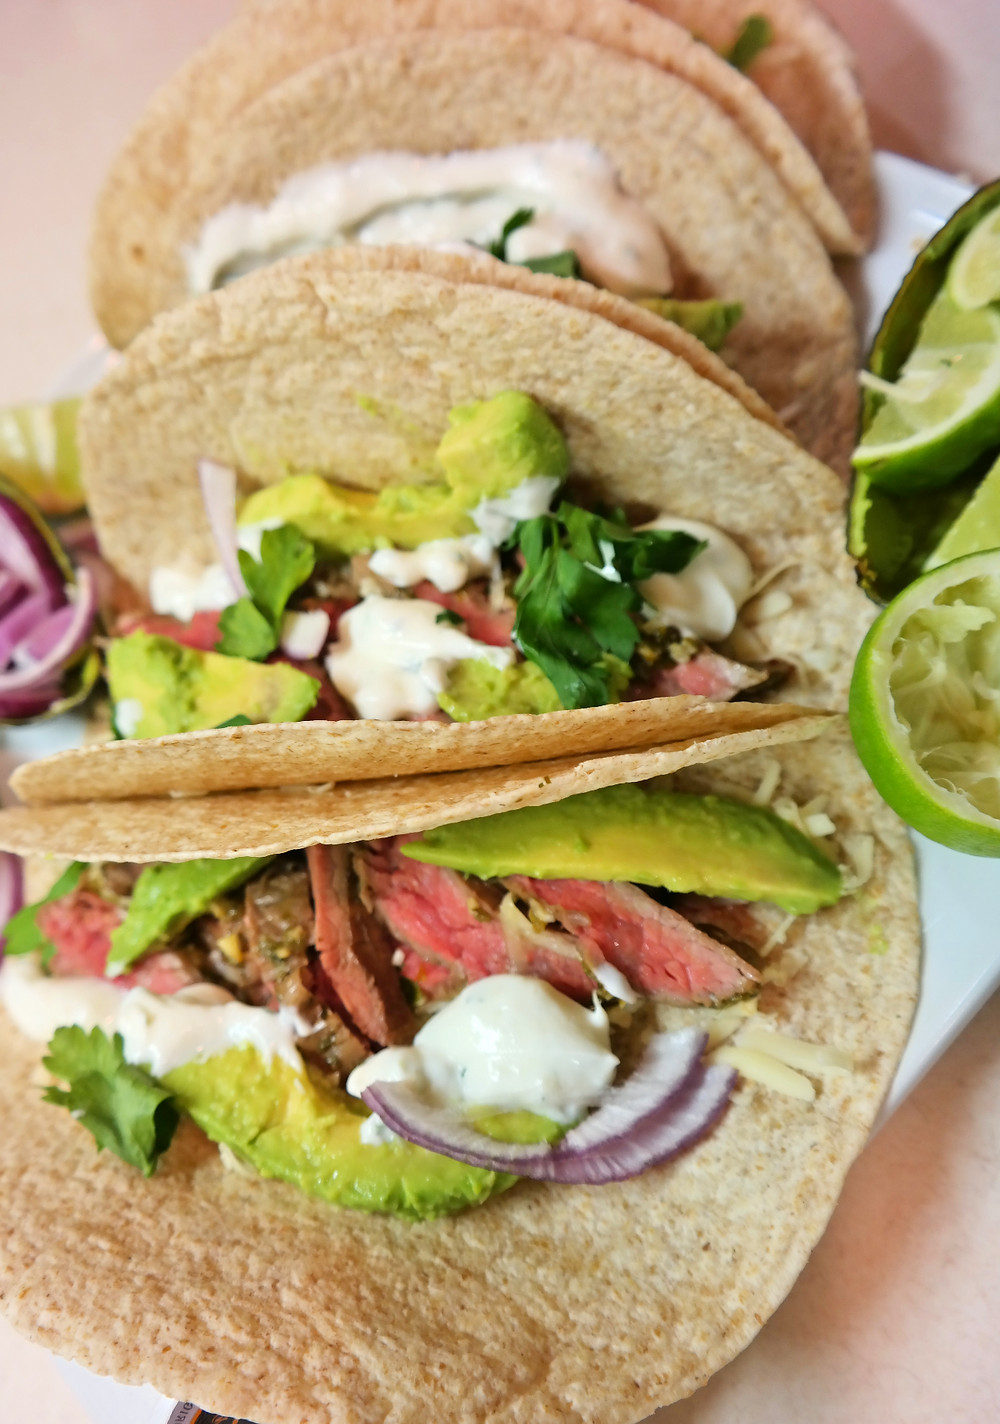 Garlic-Lime, Steak Fajitas with Avocado | eatlovegarlic @eatlovegarlic